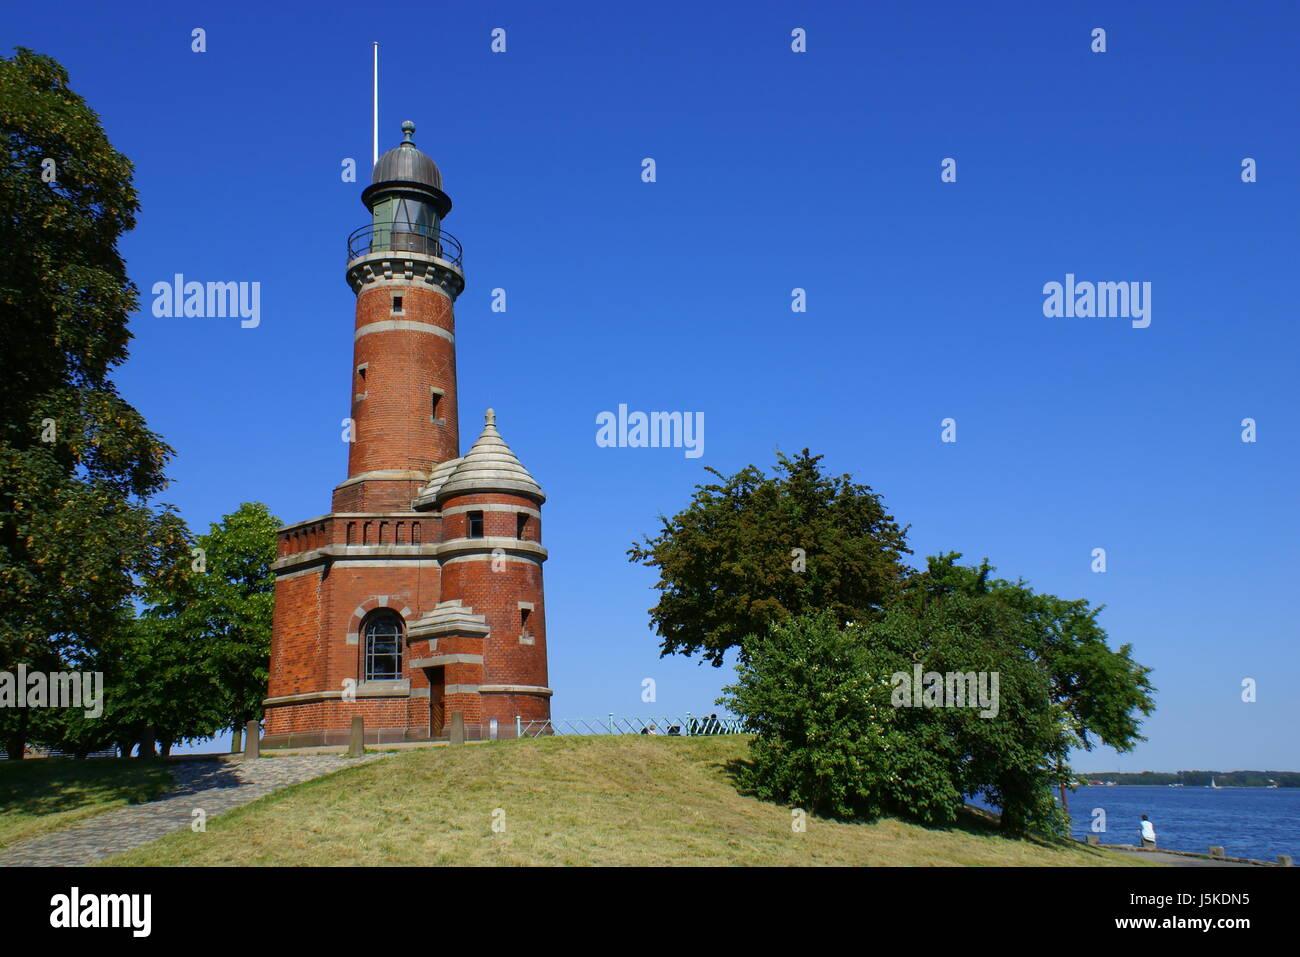 historical navy keel channel entry lighthouse holtenau nord-ostsee-kanal kieler Stock Photo